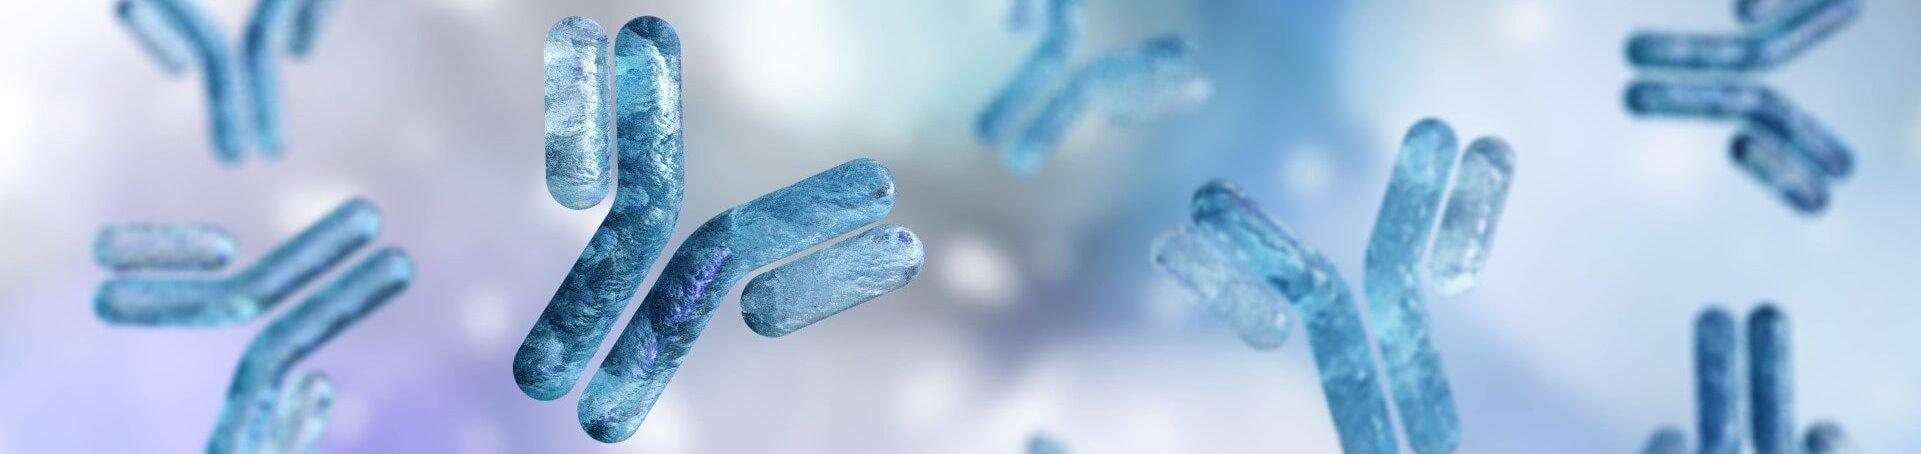 Monoclonal Antibody & Protein Production